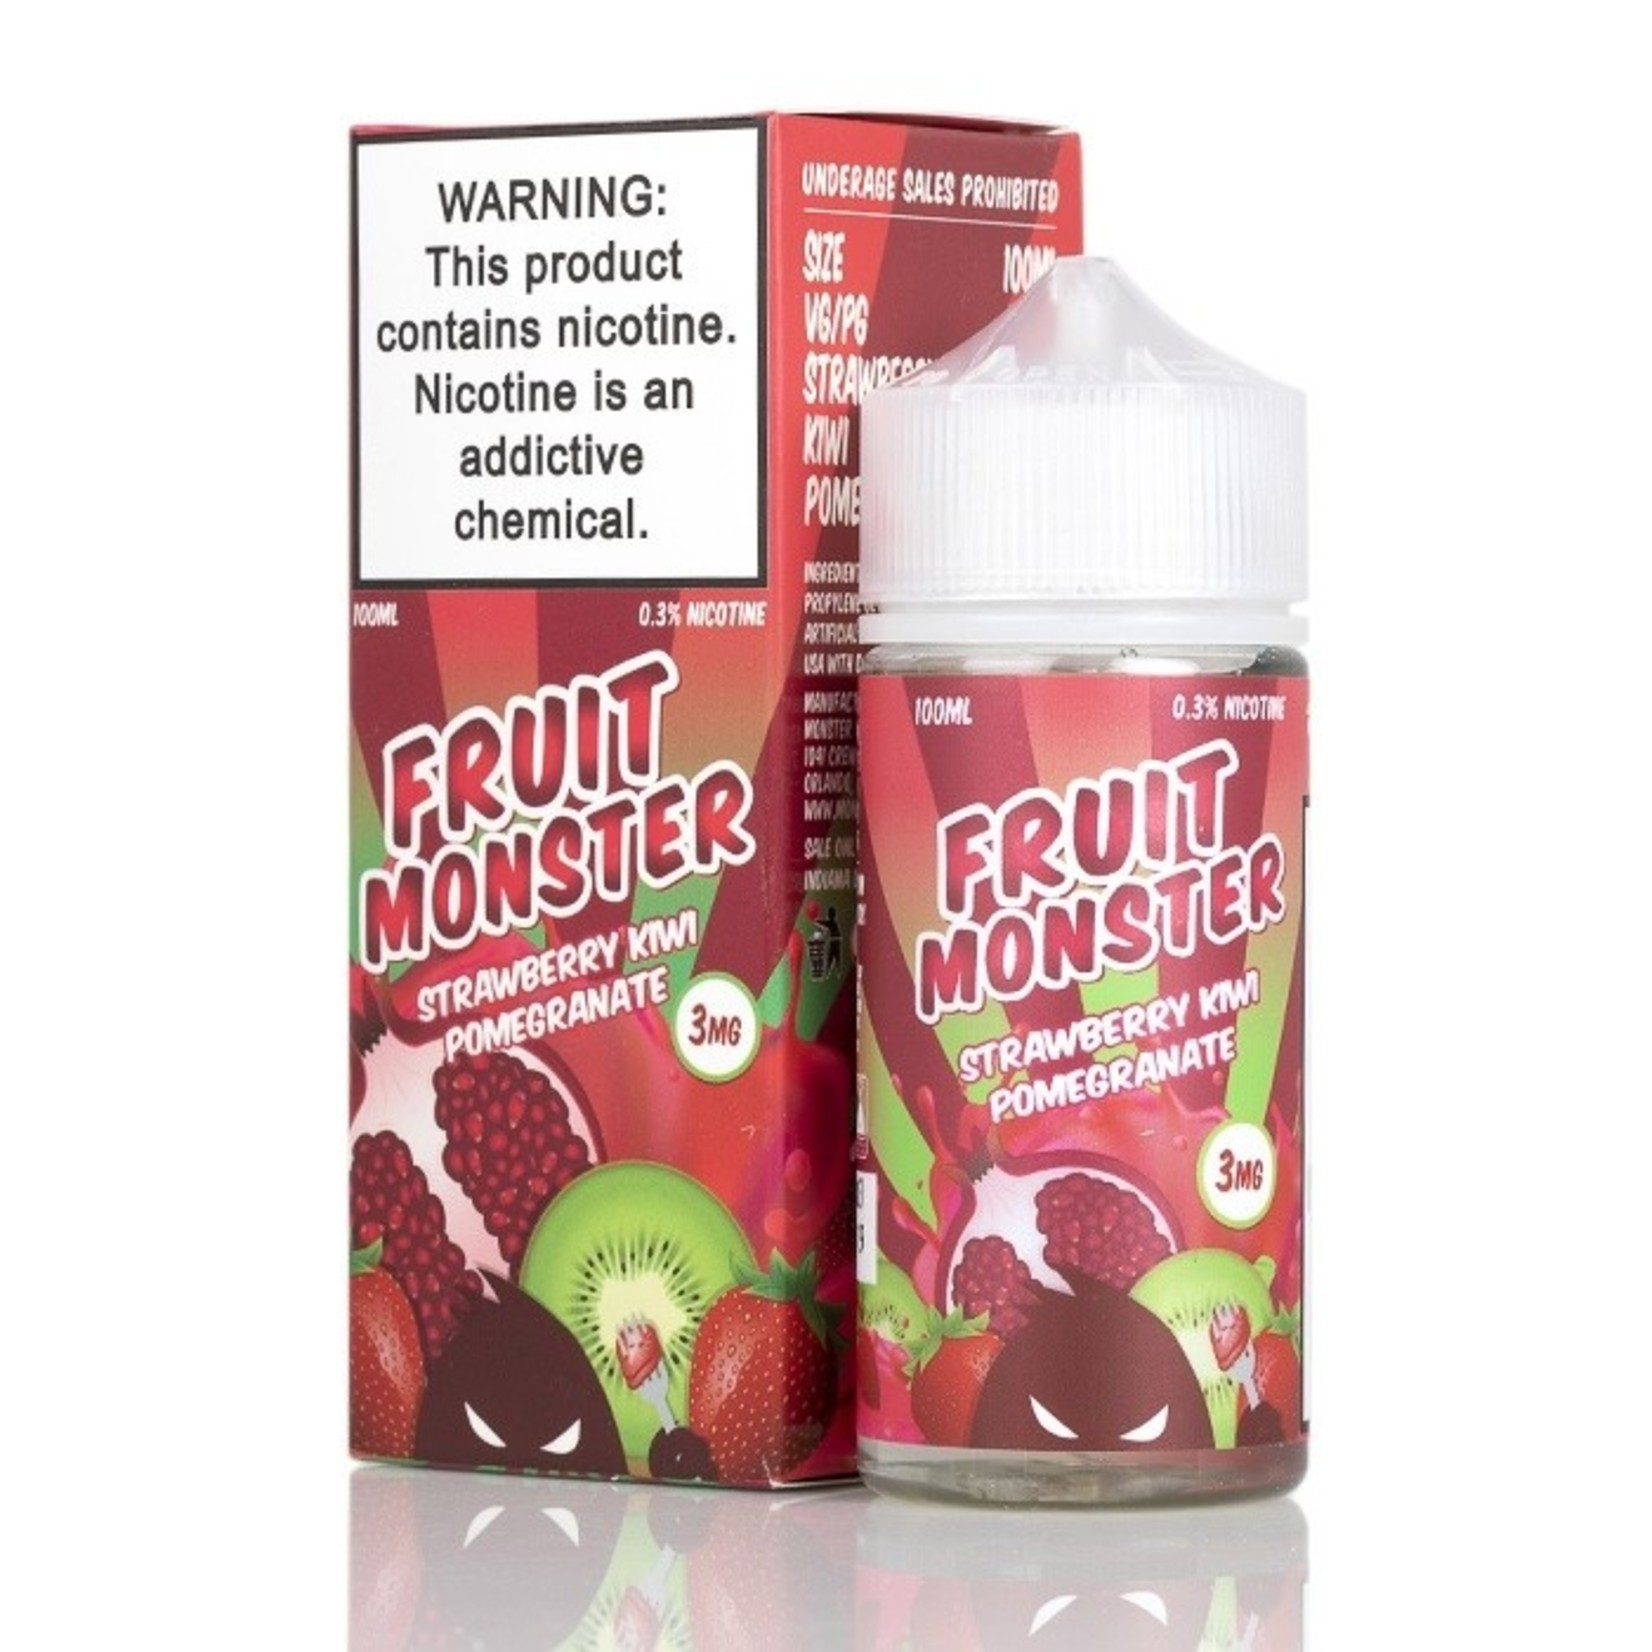 Fruit Monster Strawberry Kiwi Pomegranate